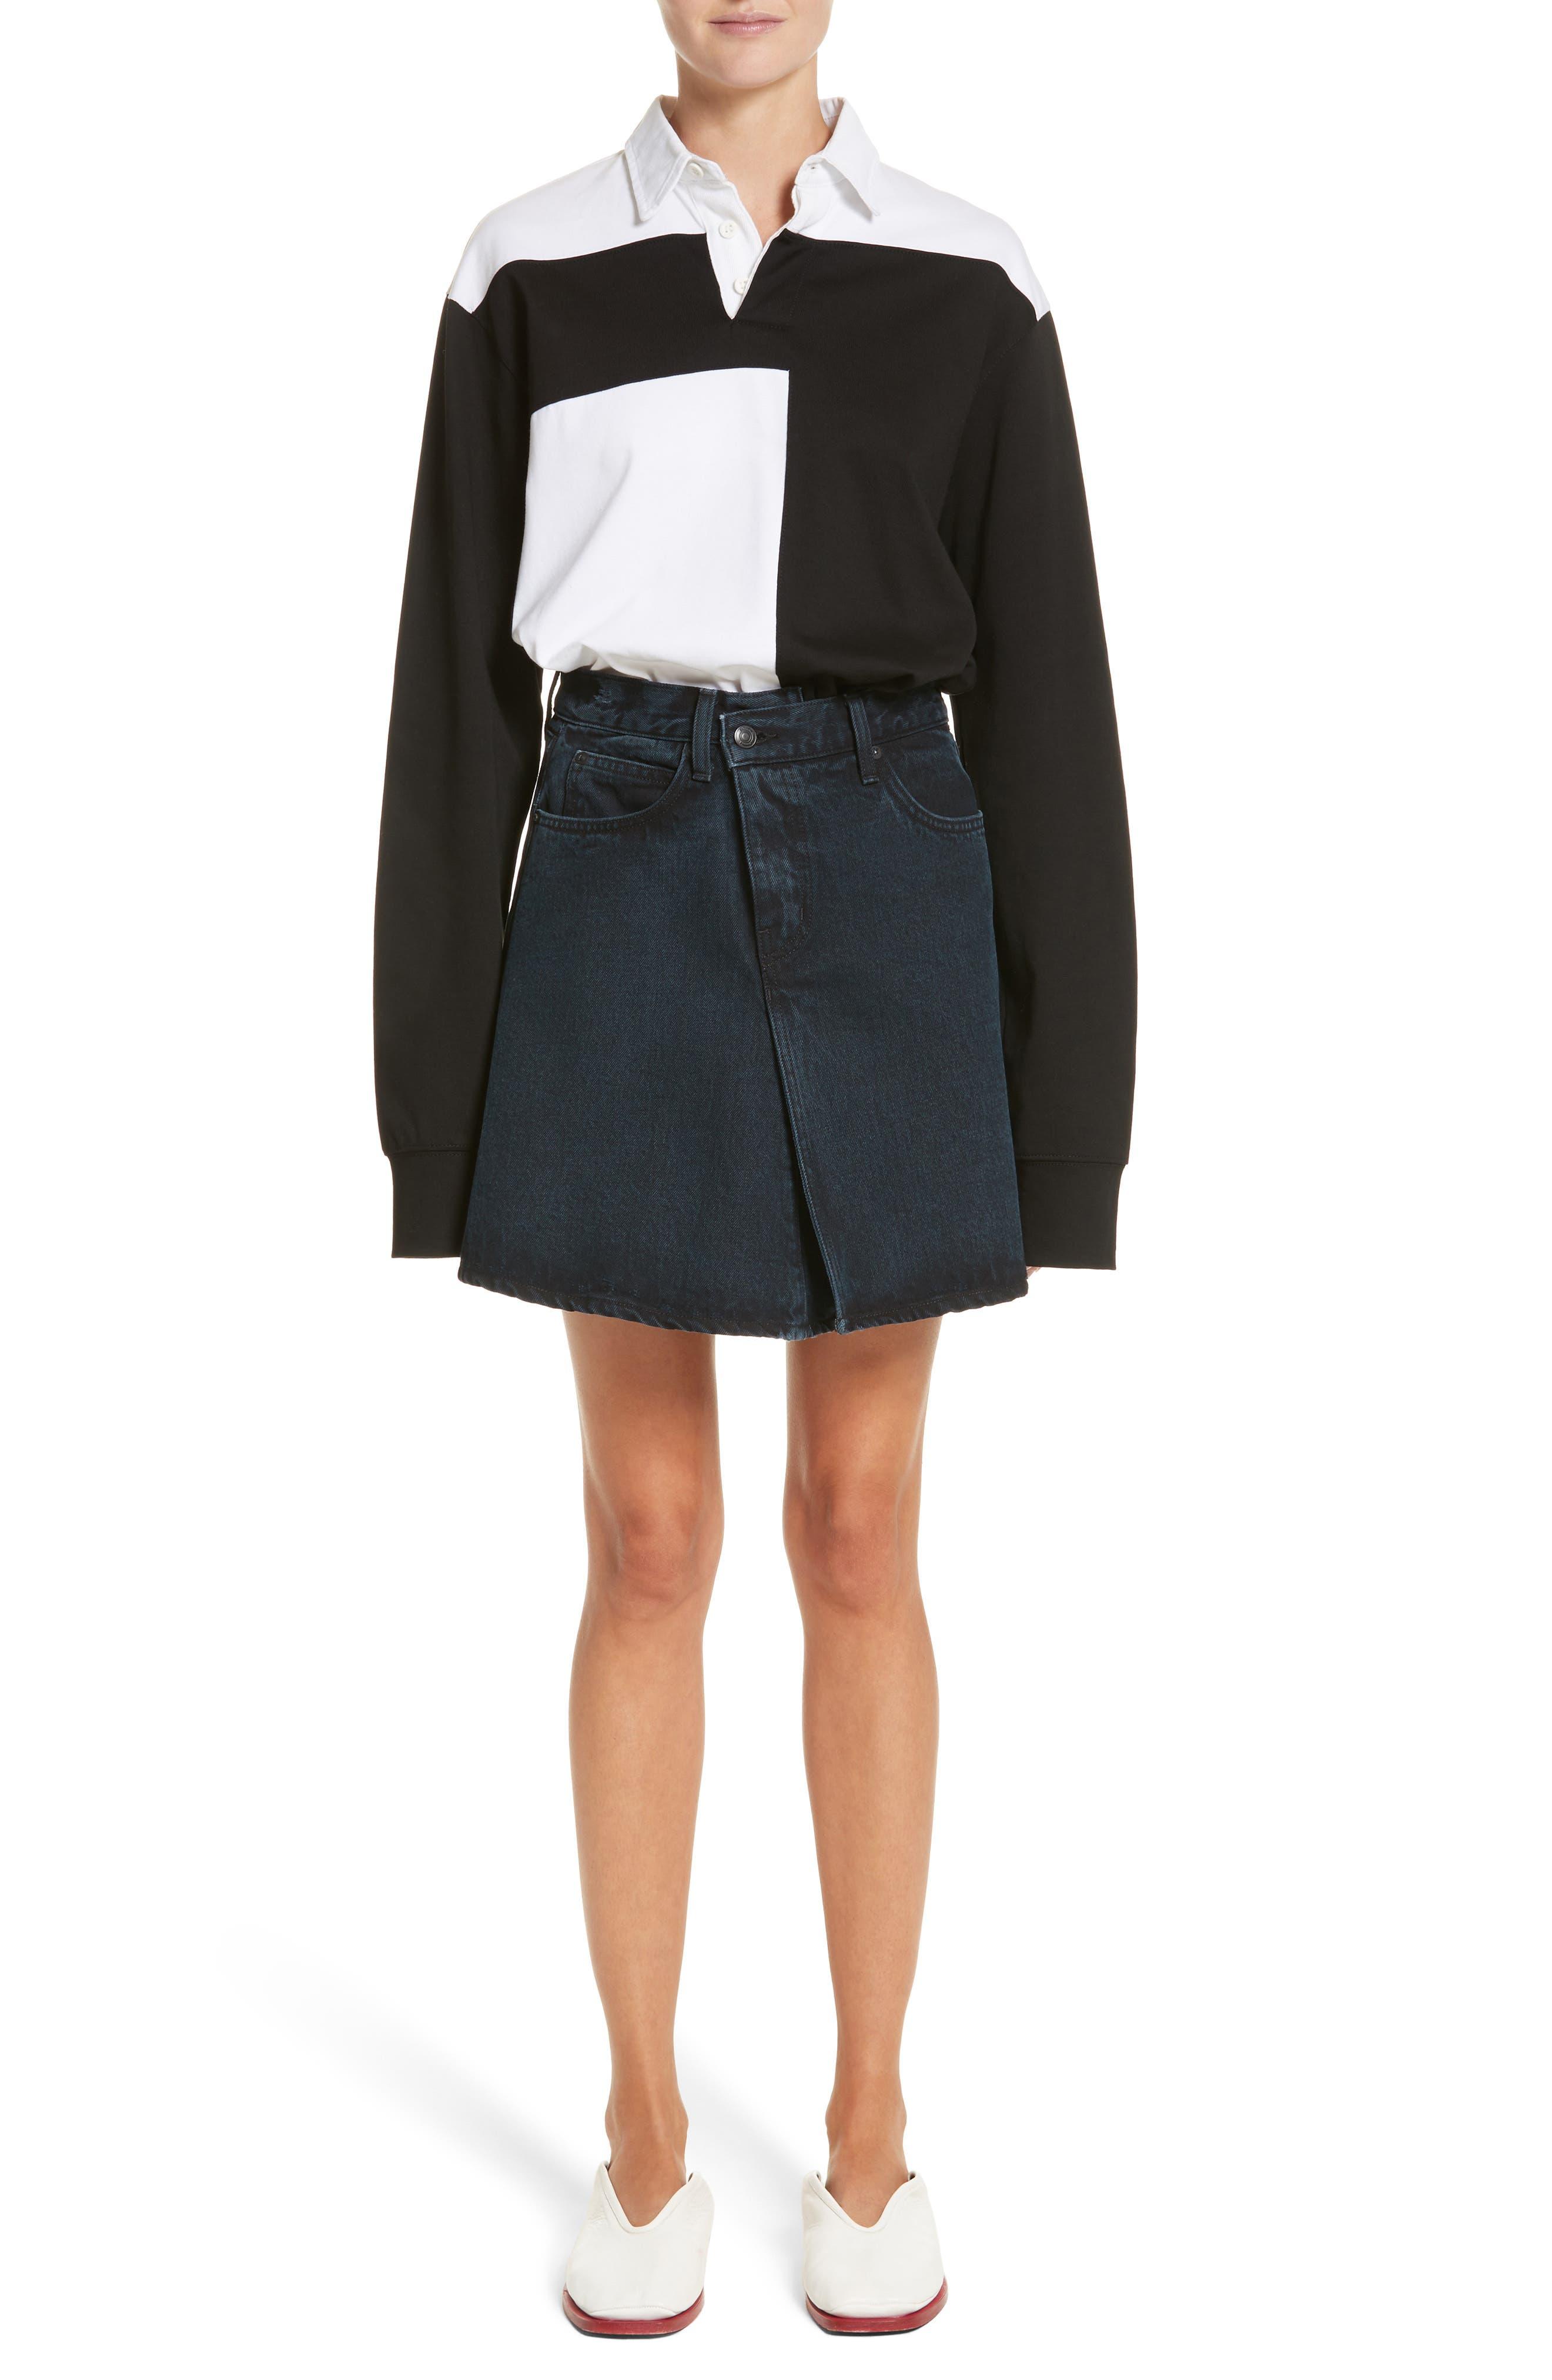 PSWL Folded Denim Skirt,                             Alternate thumbnail 7, color,                             Stone Washed Black